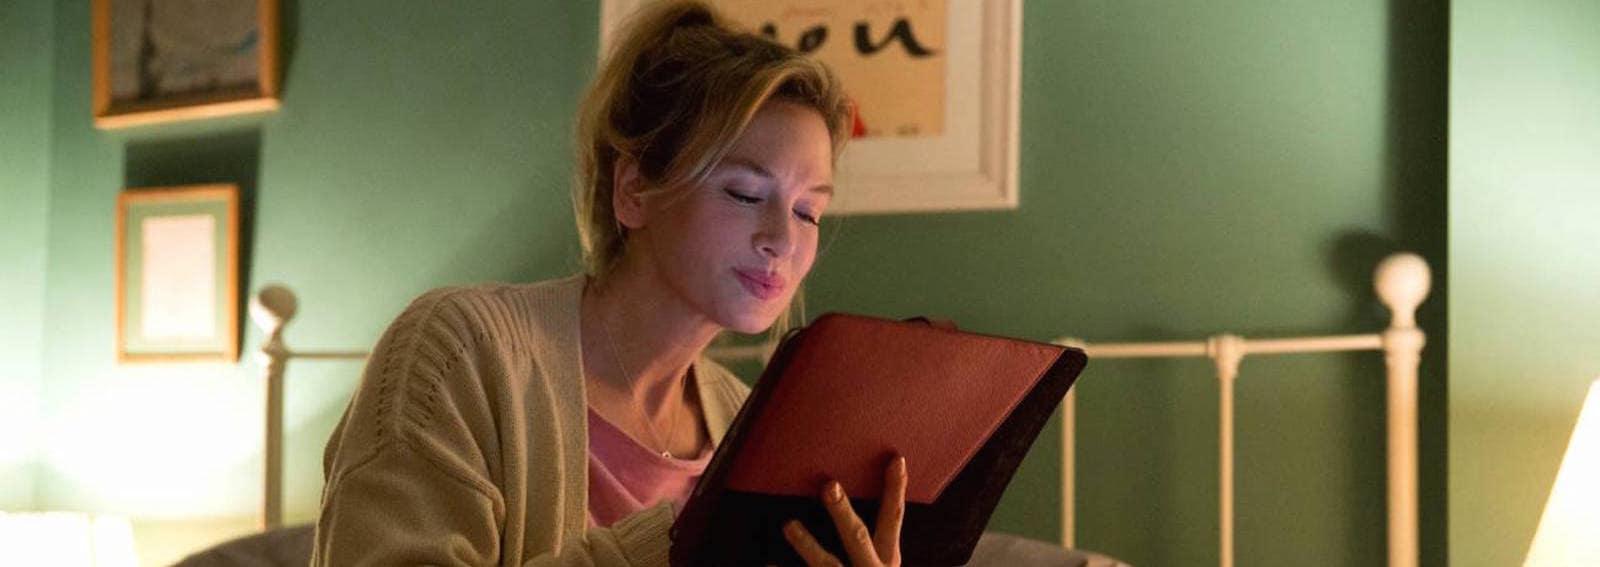 Bridget Jones letto